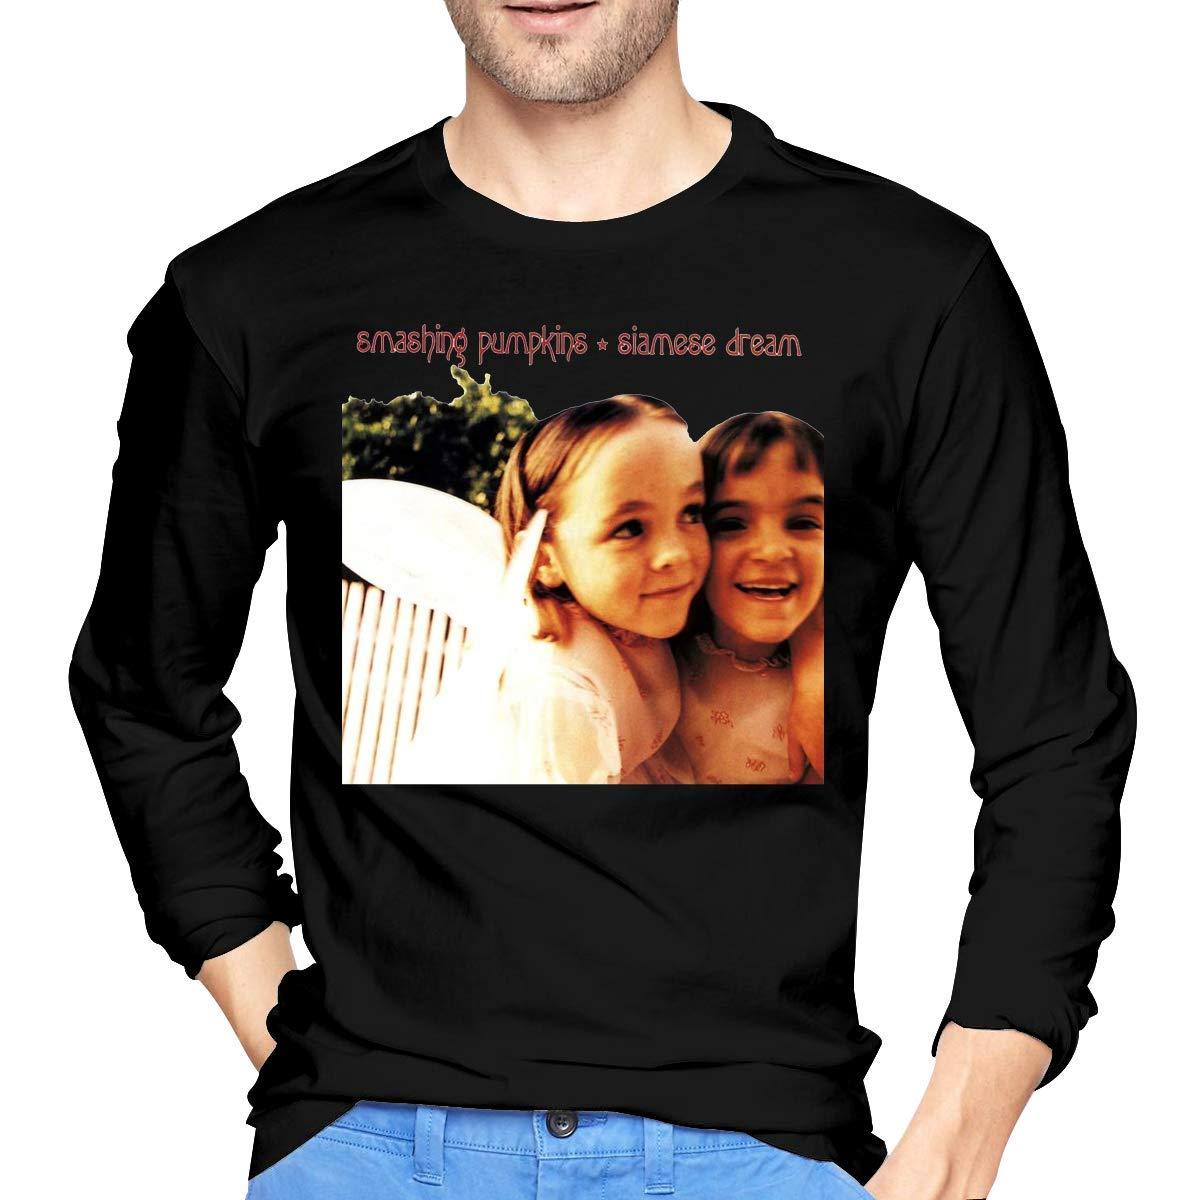 Fssatung S The Smashing Pumpkins Siamese Dream Tee Black Shirts